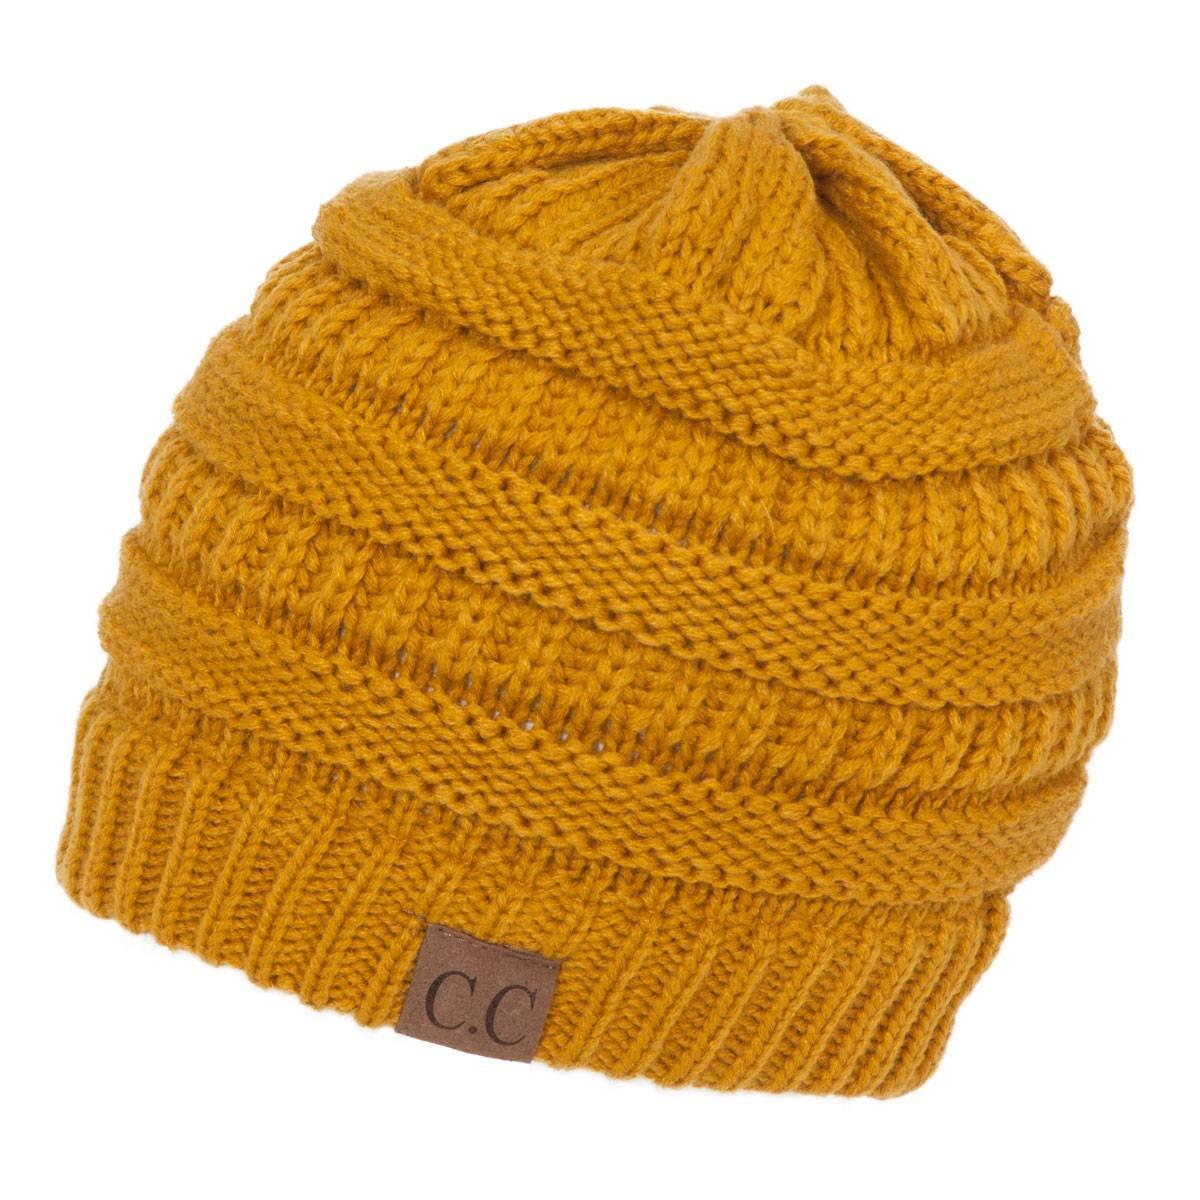 C.C Women s Thick Knit Beanie f2988c1db4e